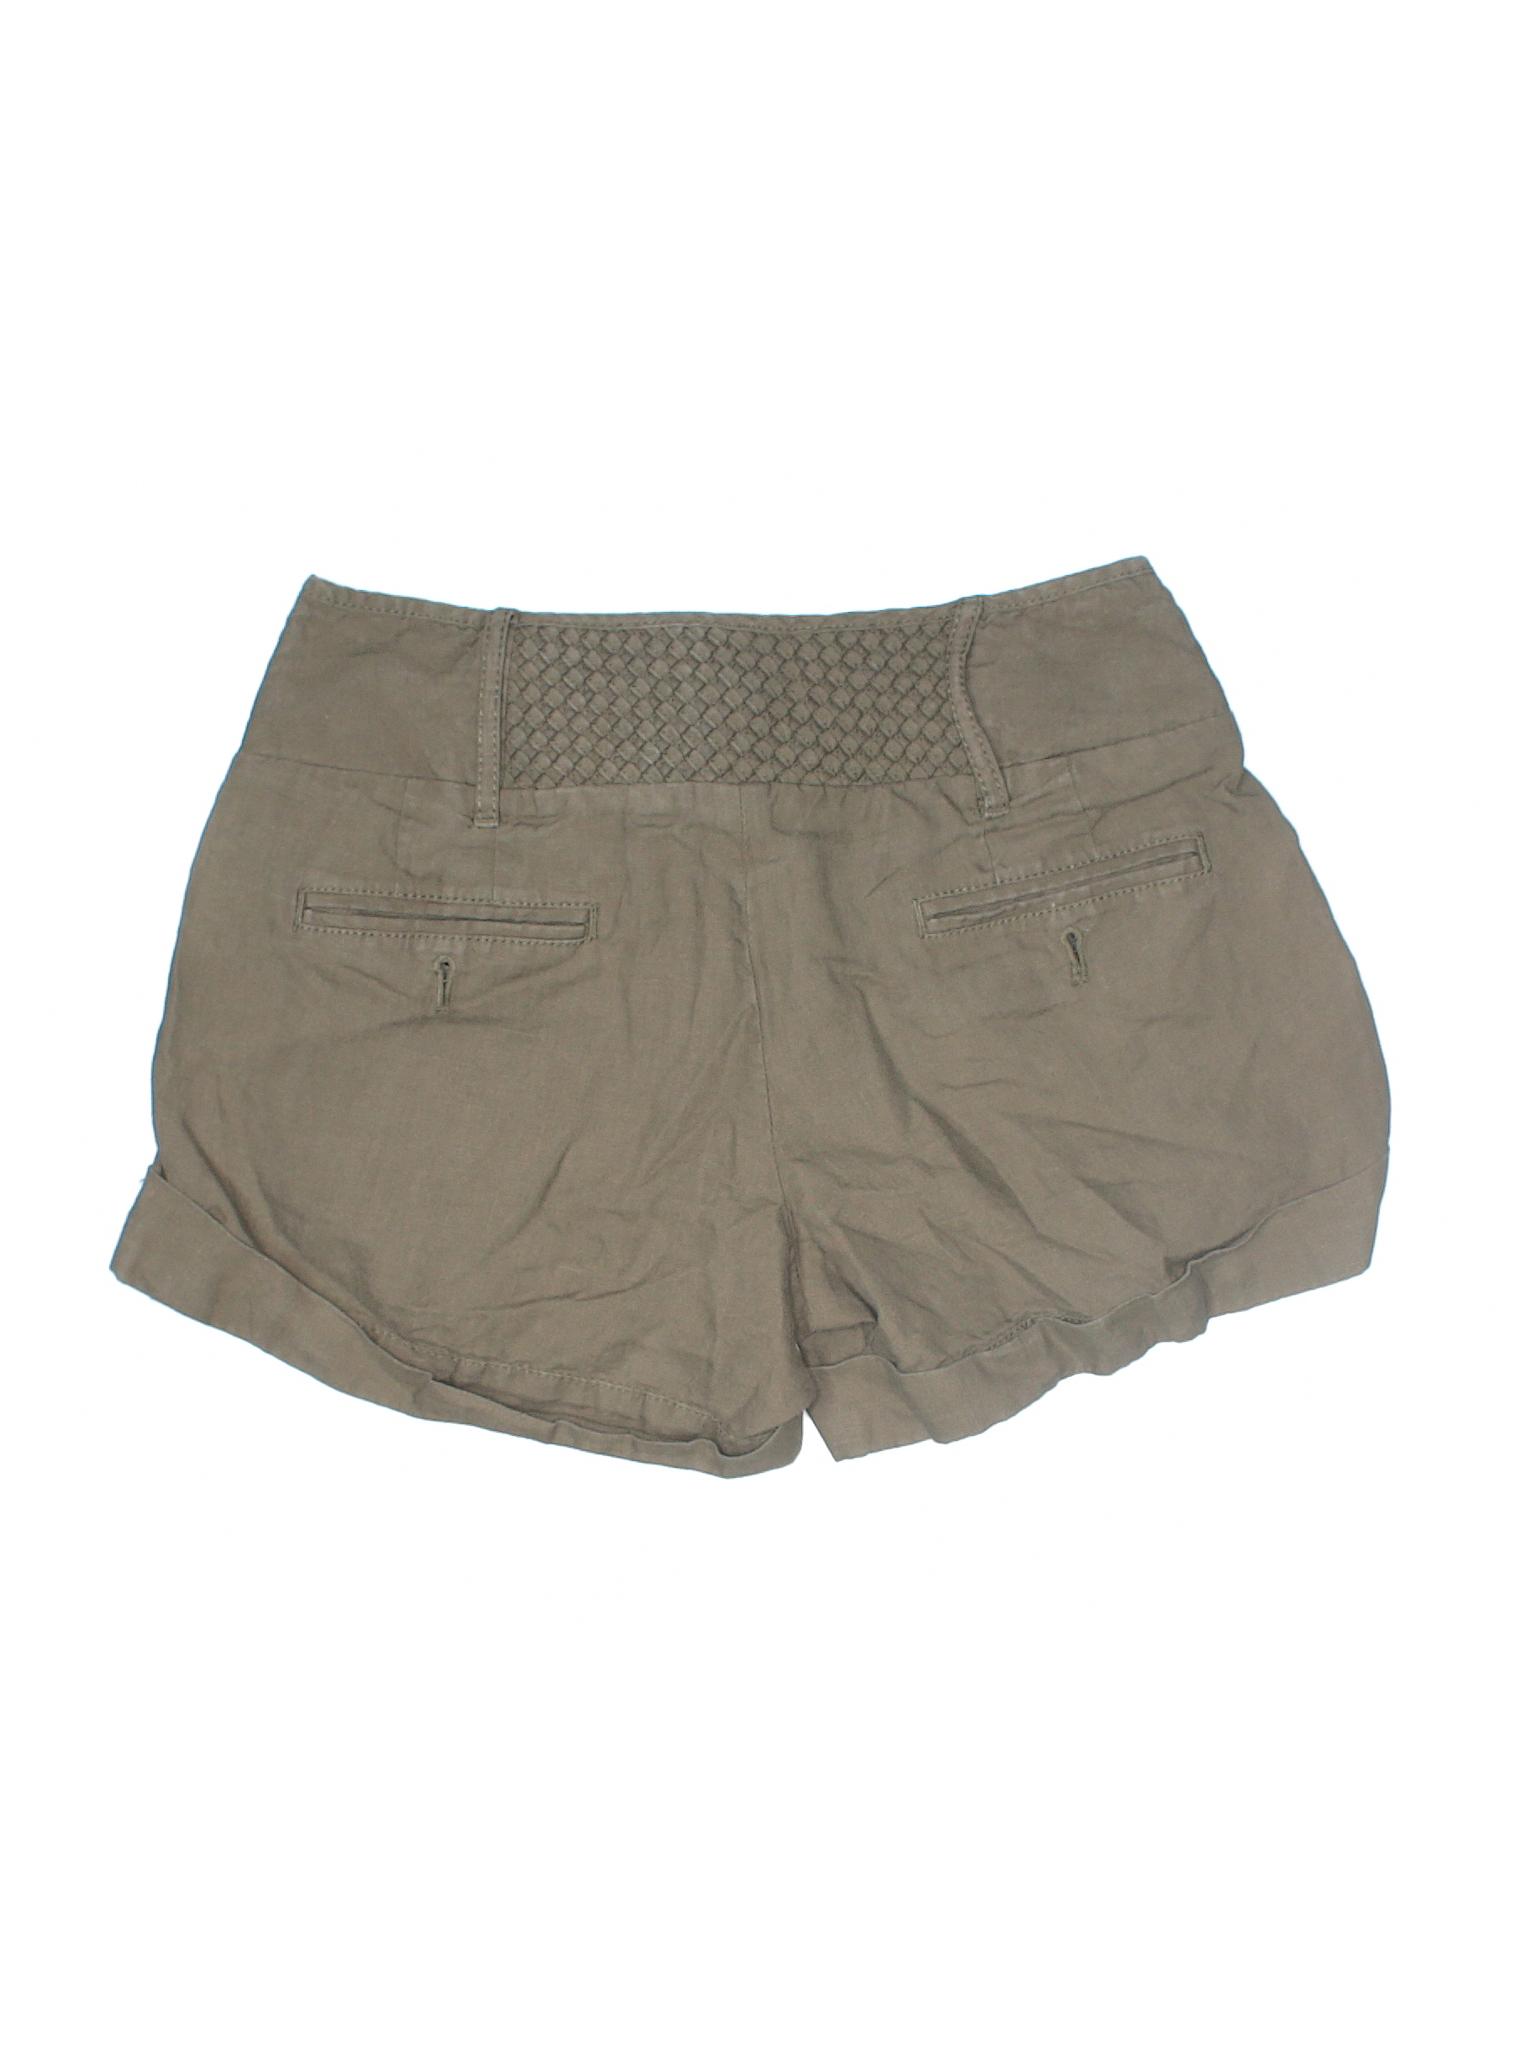 Taylor Ann Shorts LOFT Boutique Shorts Taylor Taylor Ann LOFT Ann Shorts Boutique LOFT Boutique XCR8vxfqw